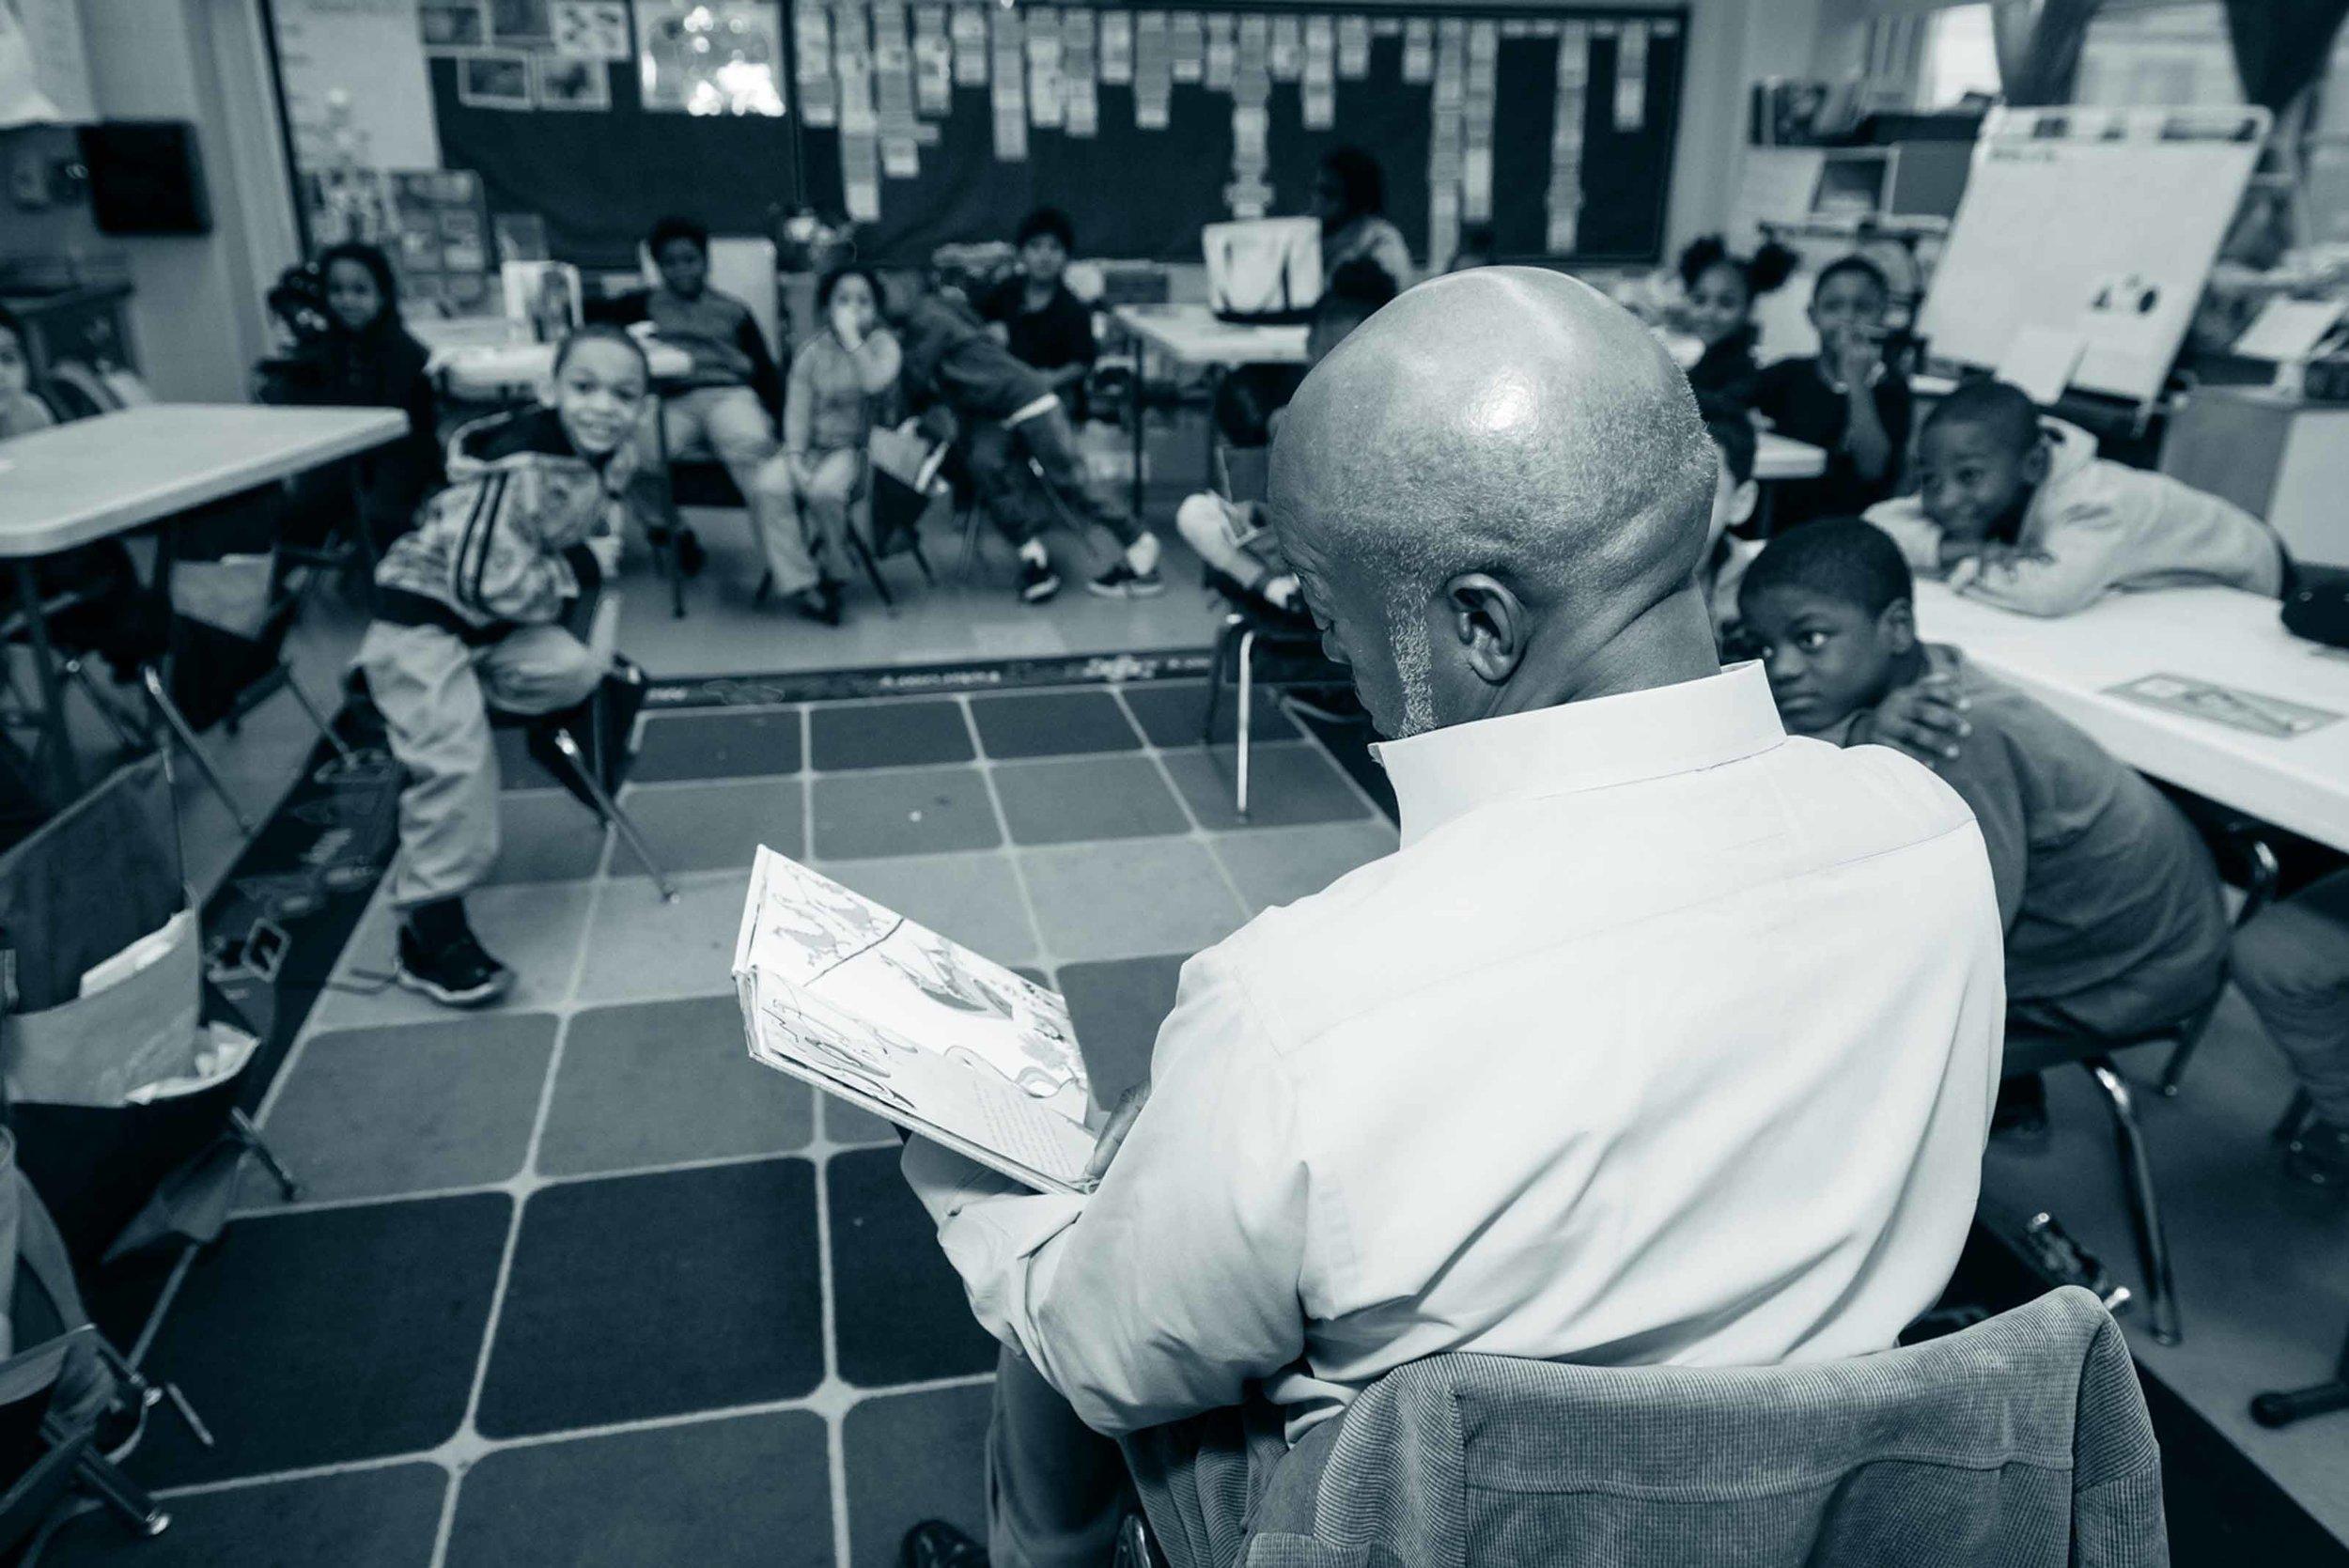 2018-03-02 Read Across America - Camden St School - Newark NJ-59.jpg